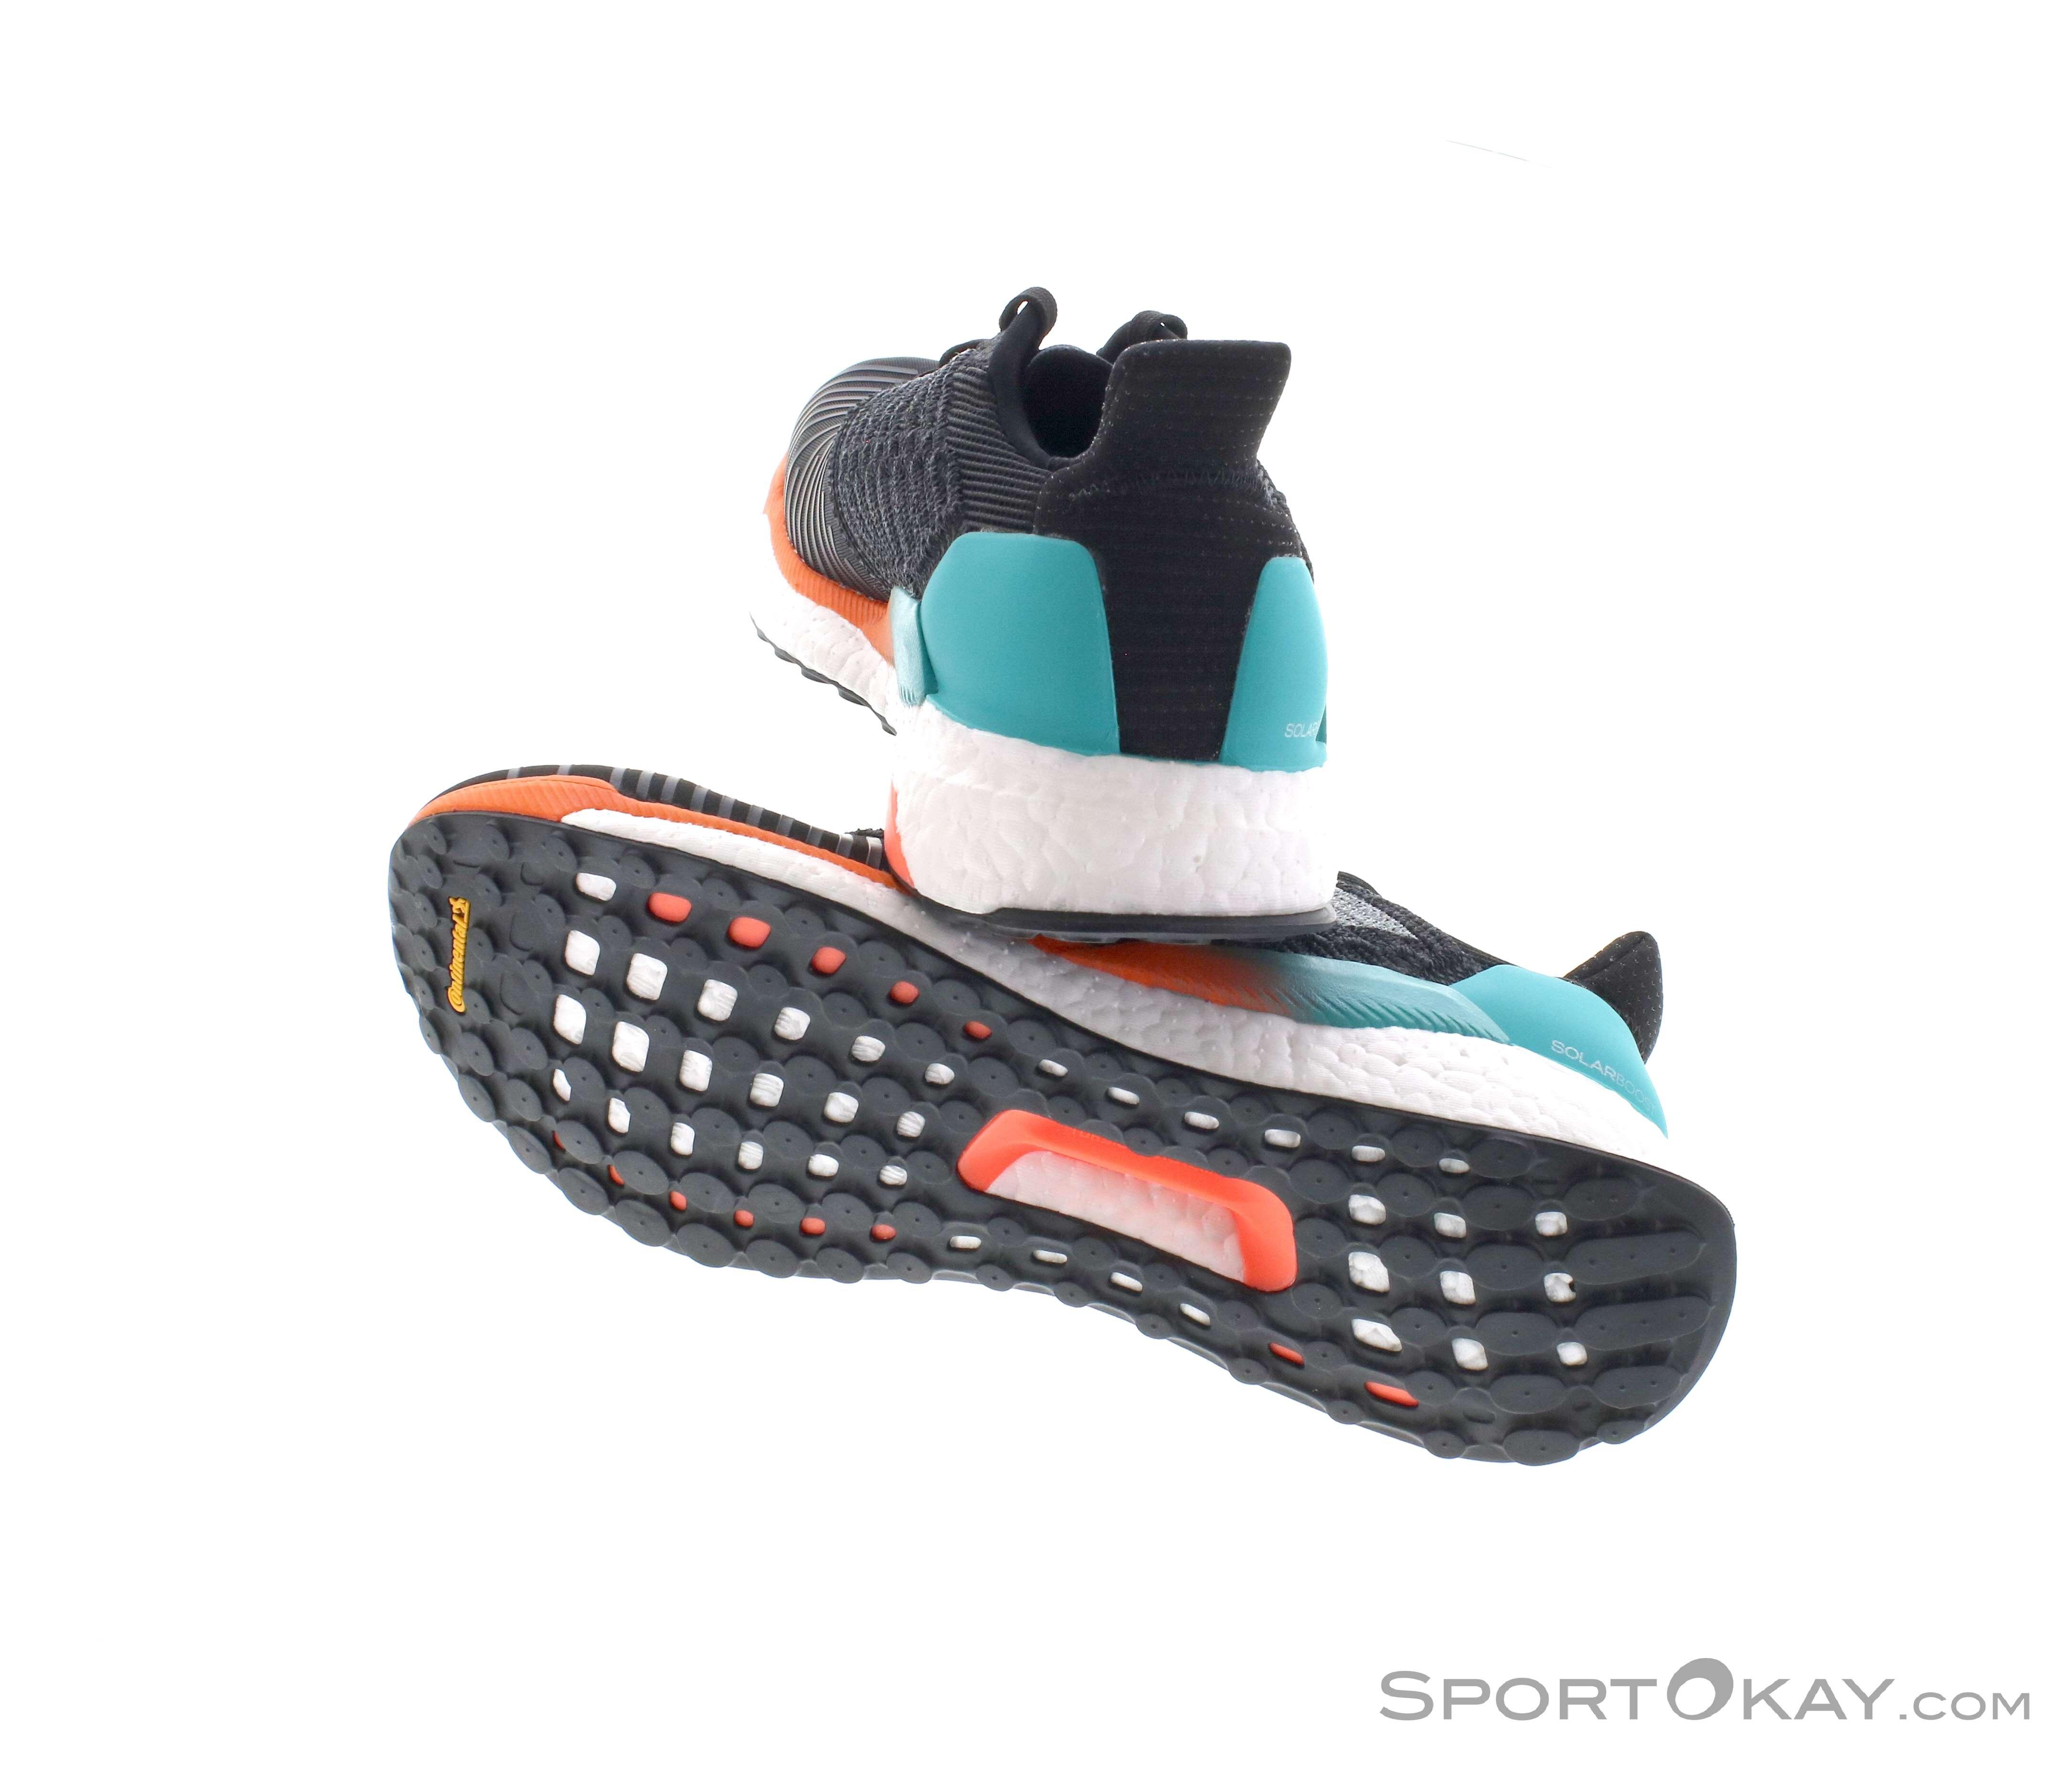 Su Da Boost Solar Adidas Scarpe Strada Uomo Corsa wYq8IZfa